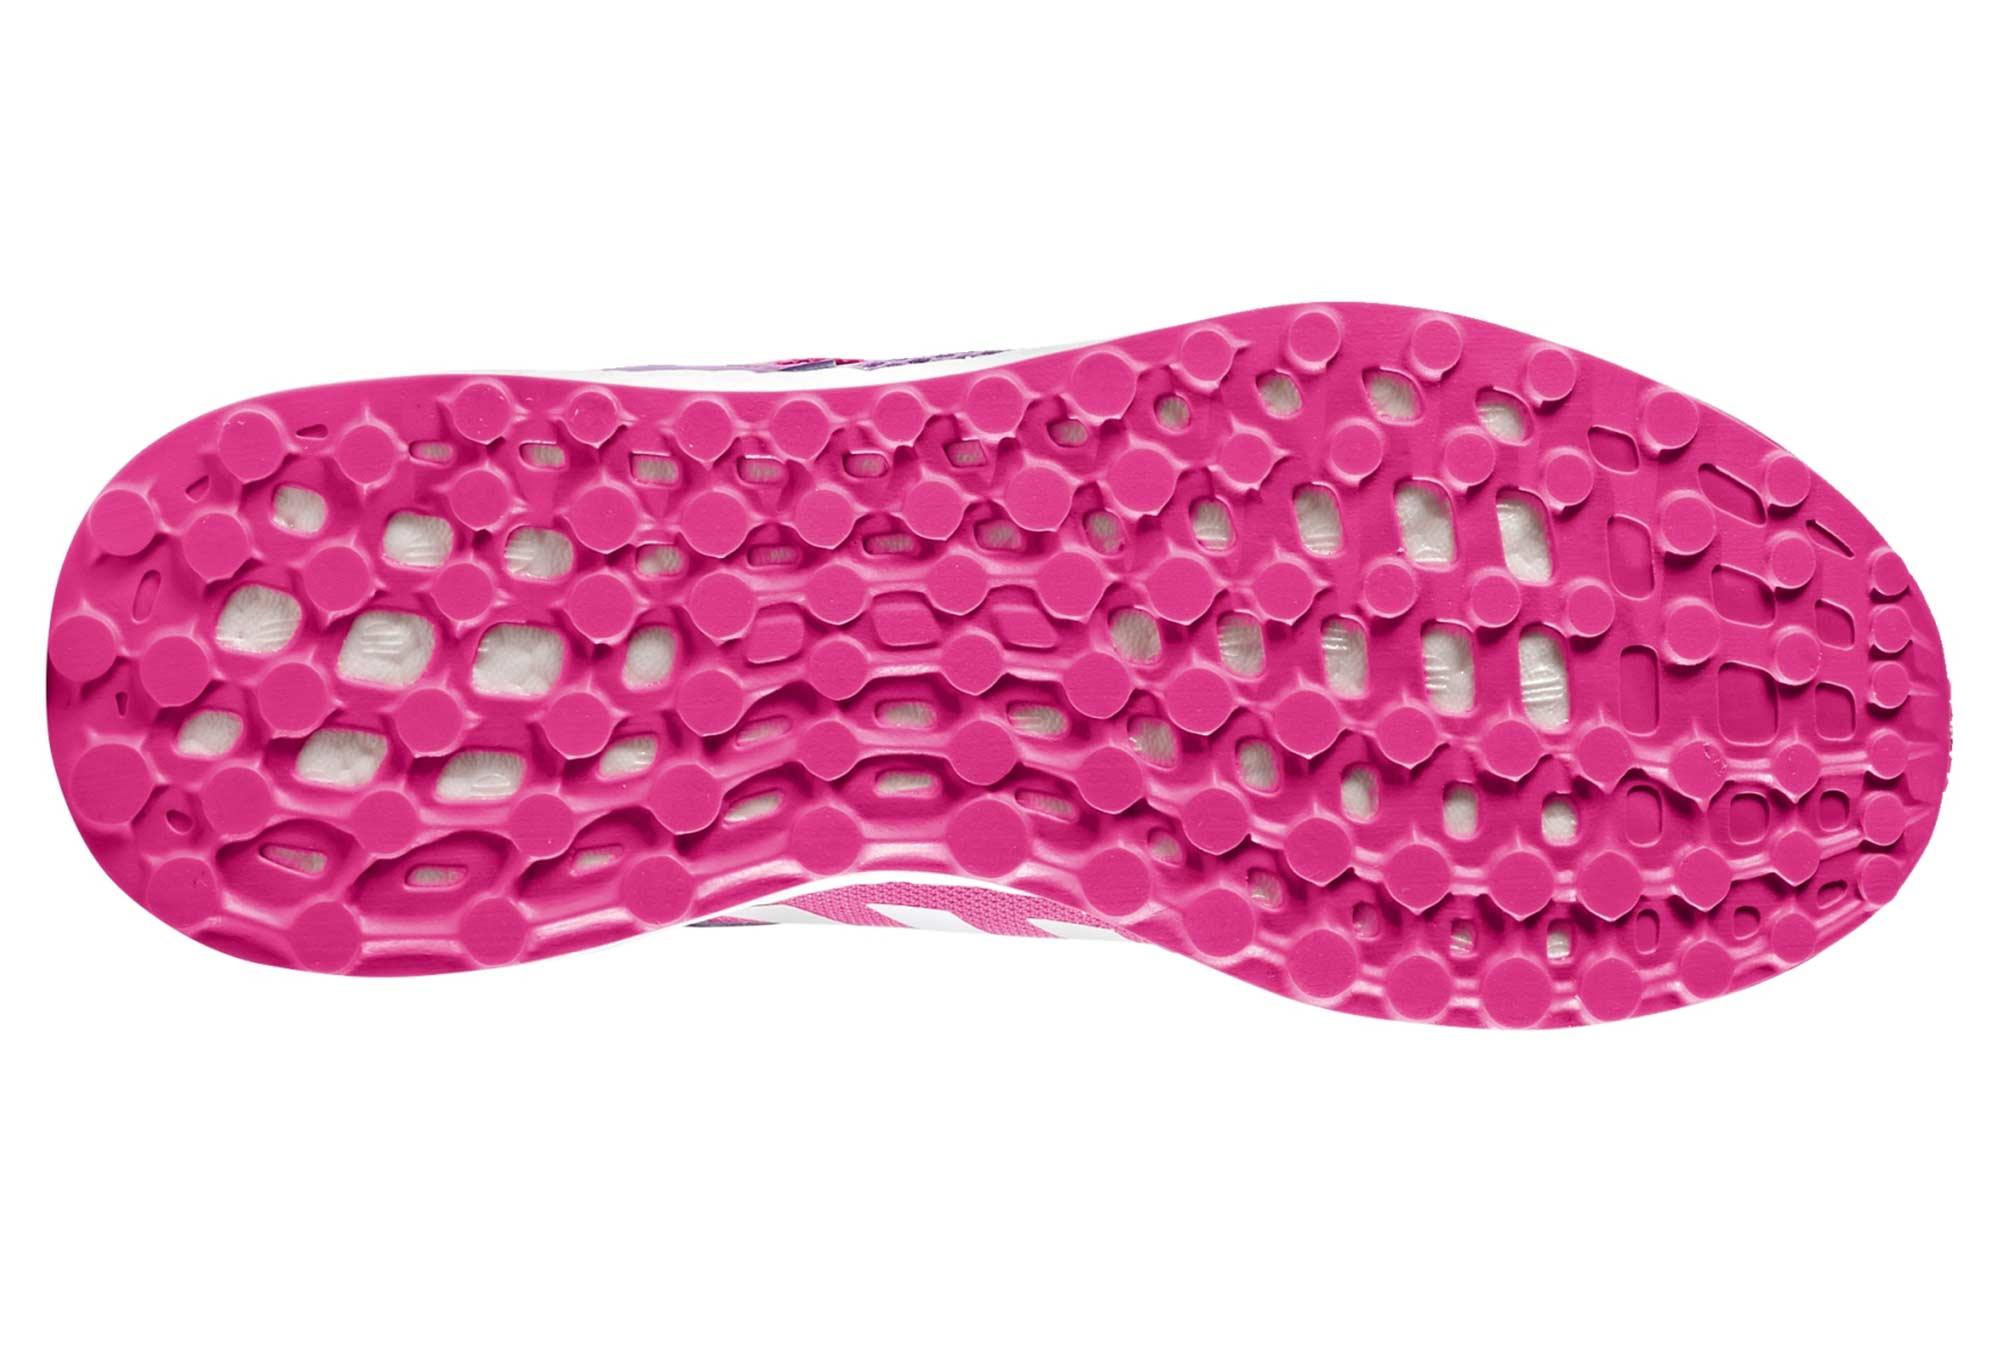 Rose Adidas Running De Response Chaussures Femme 3 Violet 50tZw